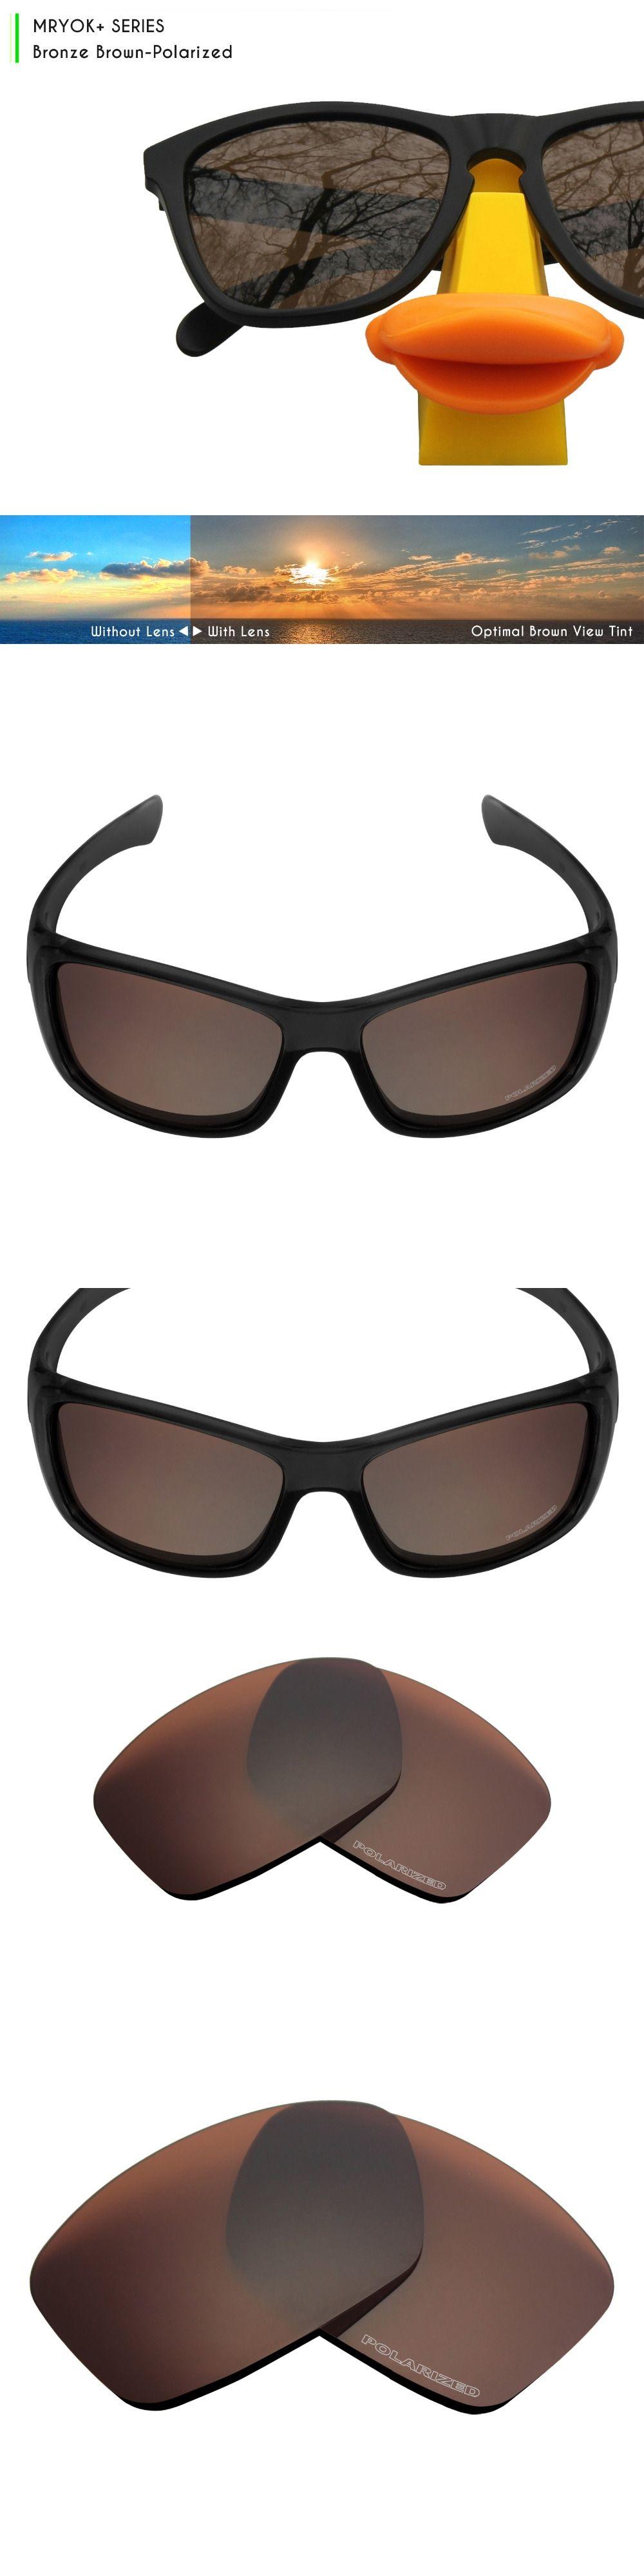 Mryok+ POLARIZED Resist SeaWater Replacement Lenses for Oakley Hijinx  Sunglasses Bronze Brown